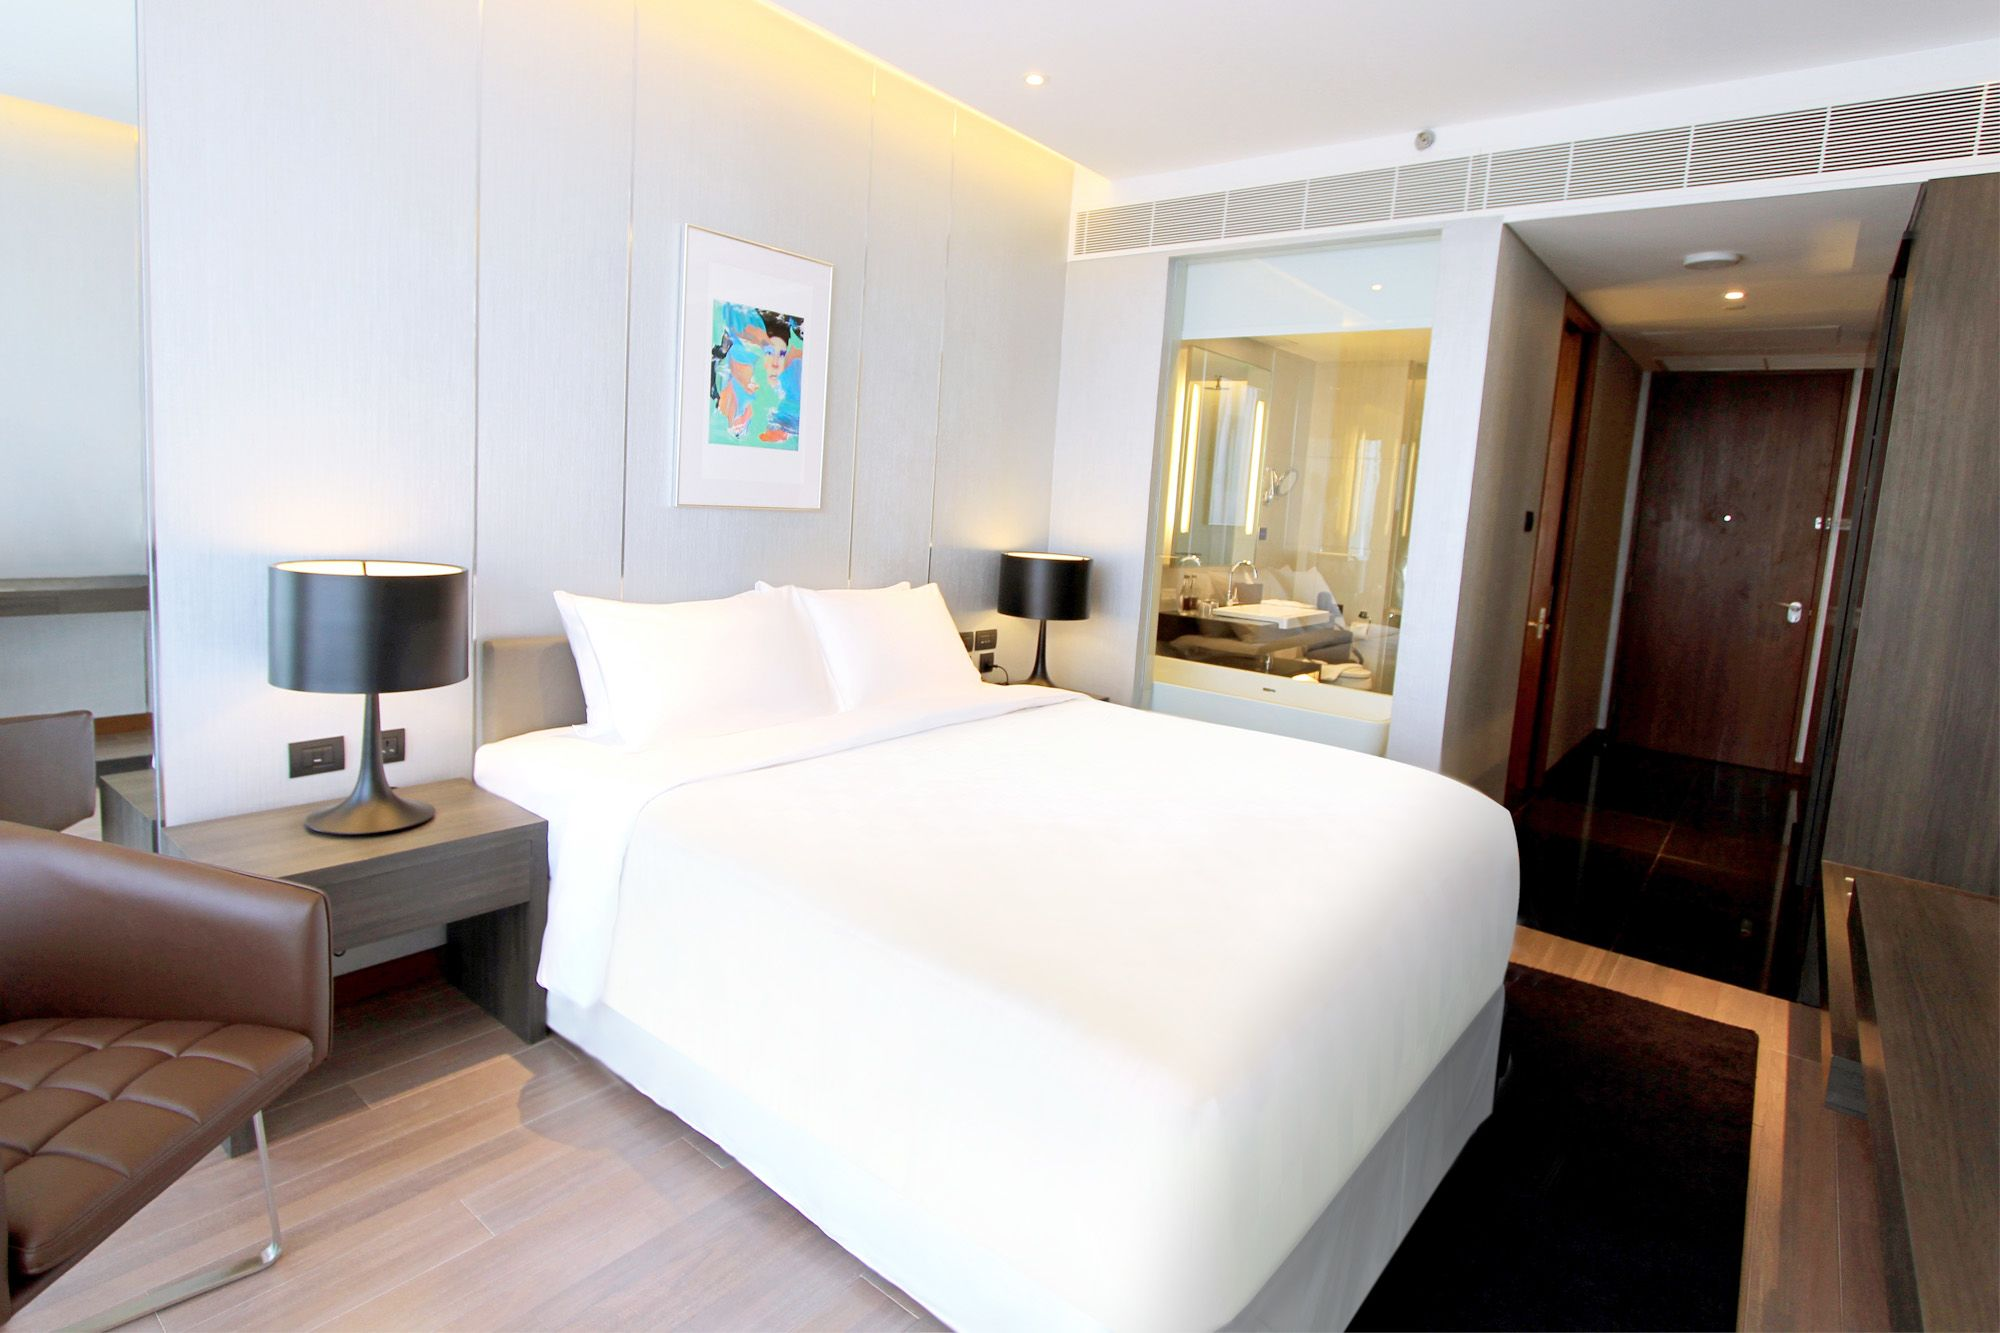 曼谷安曼納酒店(Amara Bangkok Hotel) 推出Cool Down Your Summer夏季住房優惠 夏季遊曼谷好划算